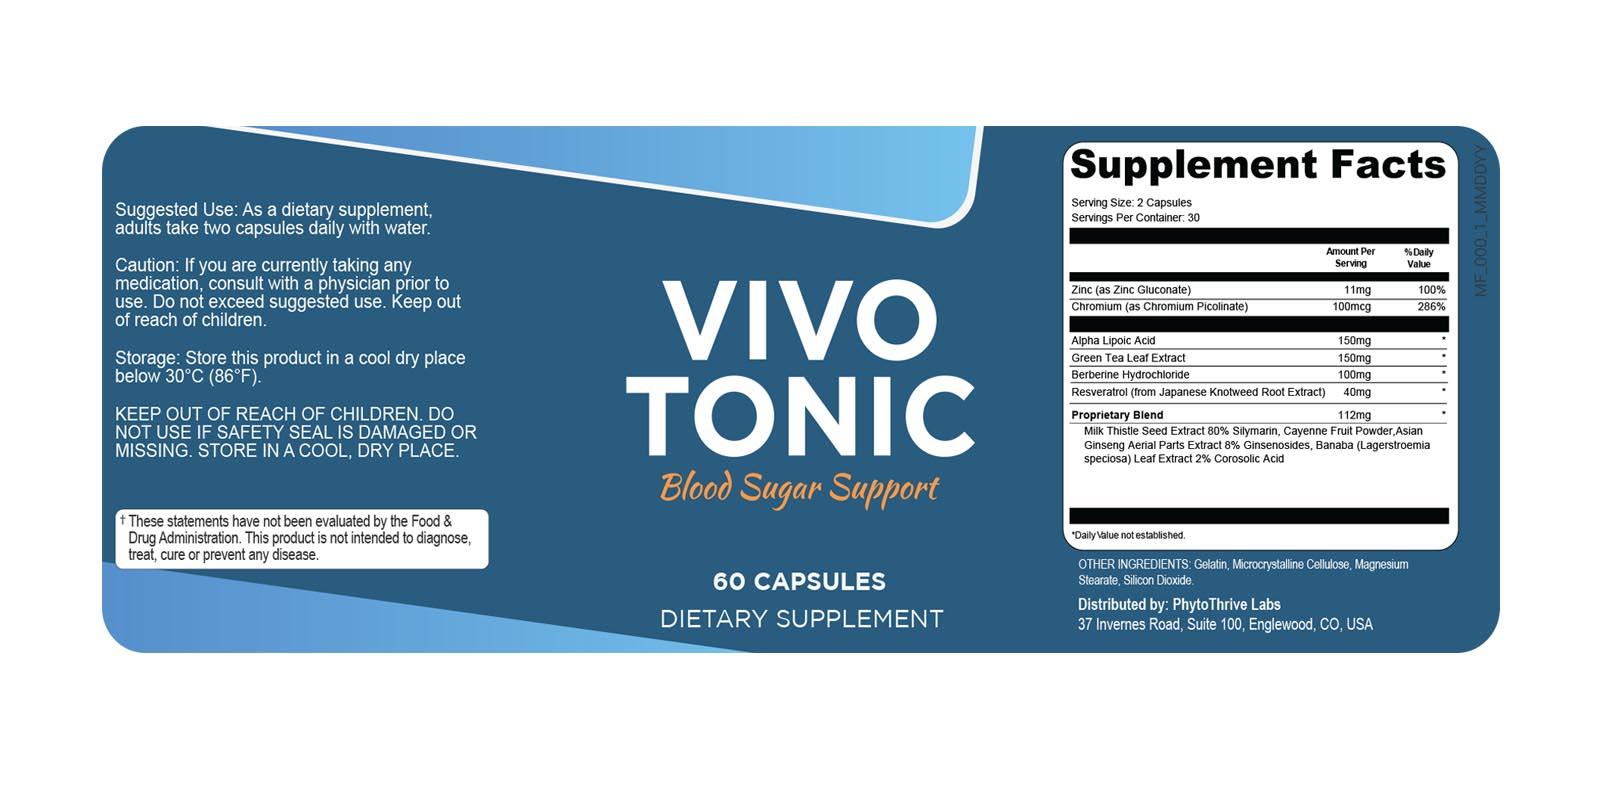 Vivo Tonic Supplement Dosage